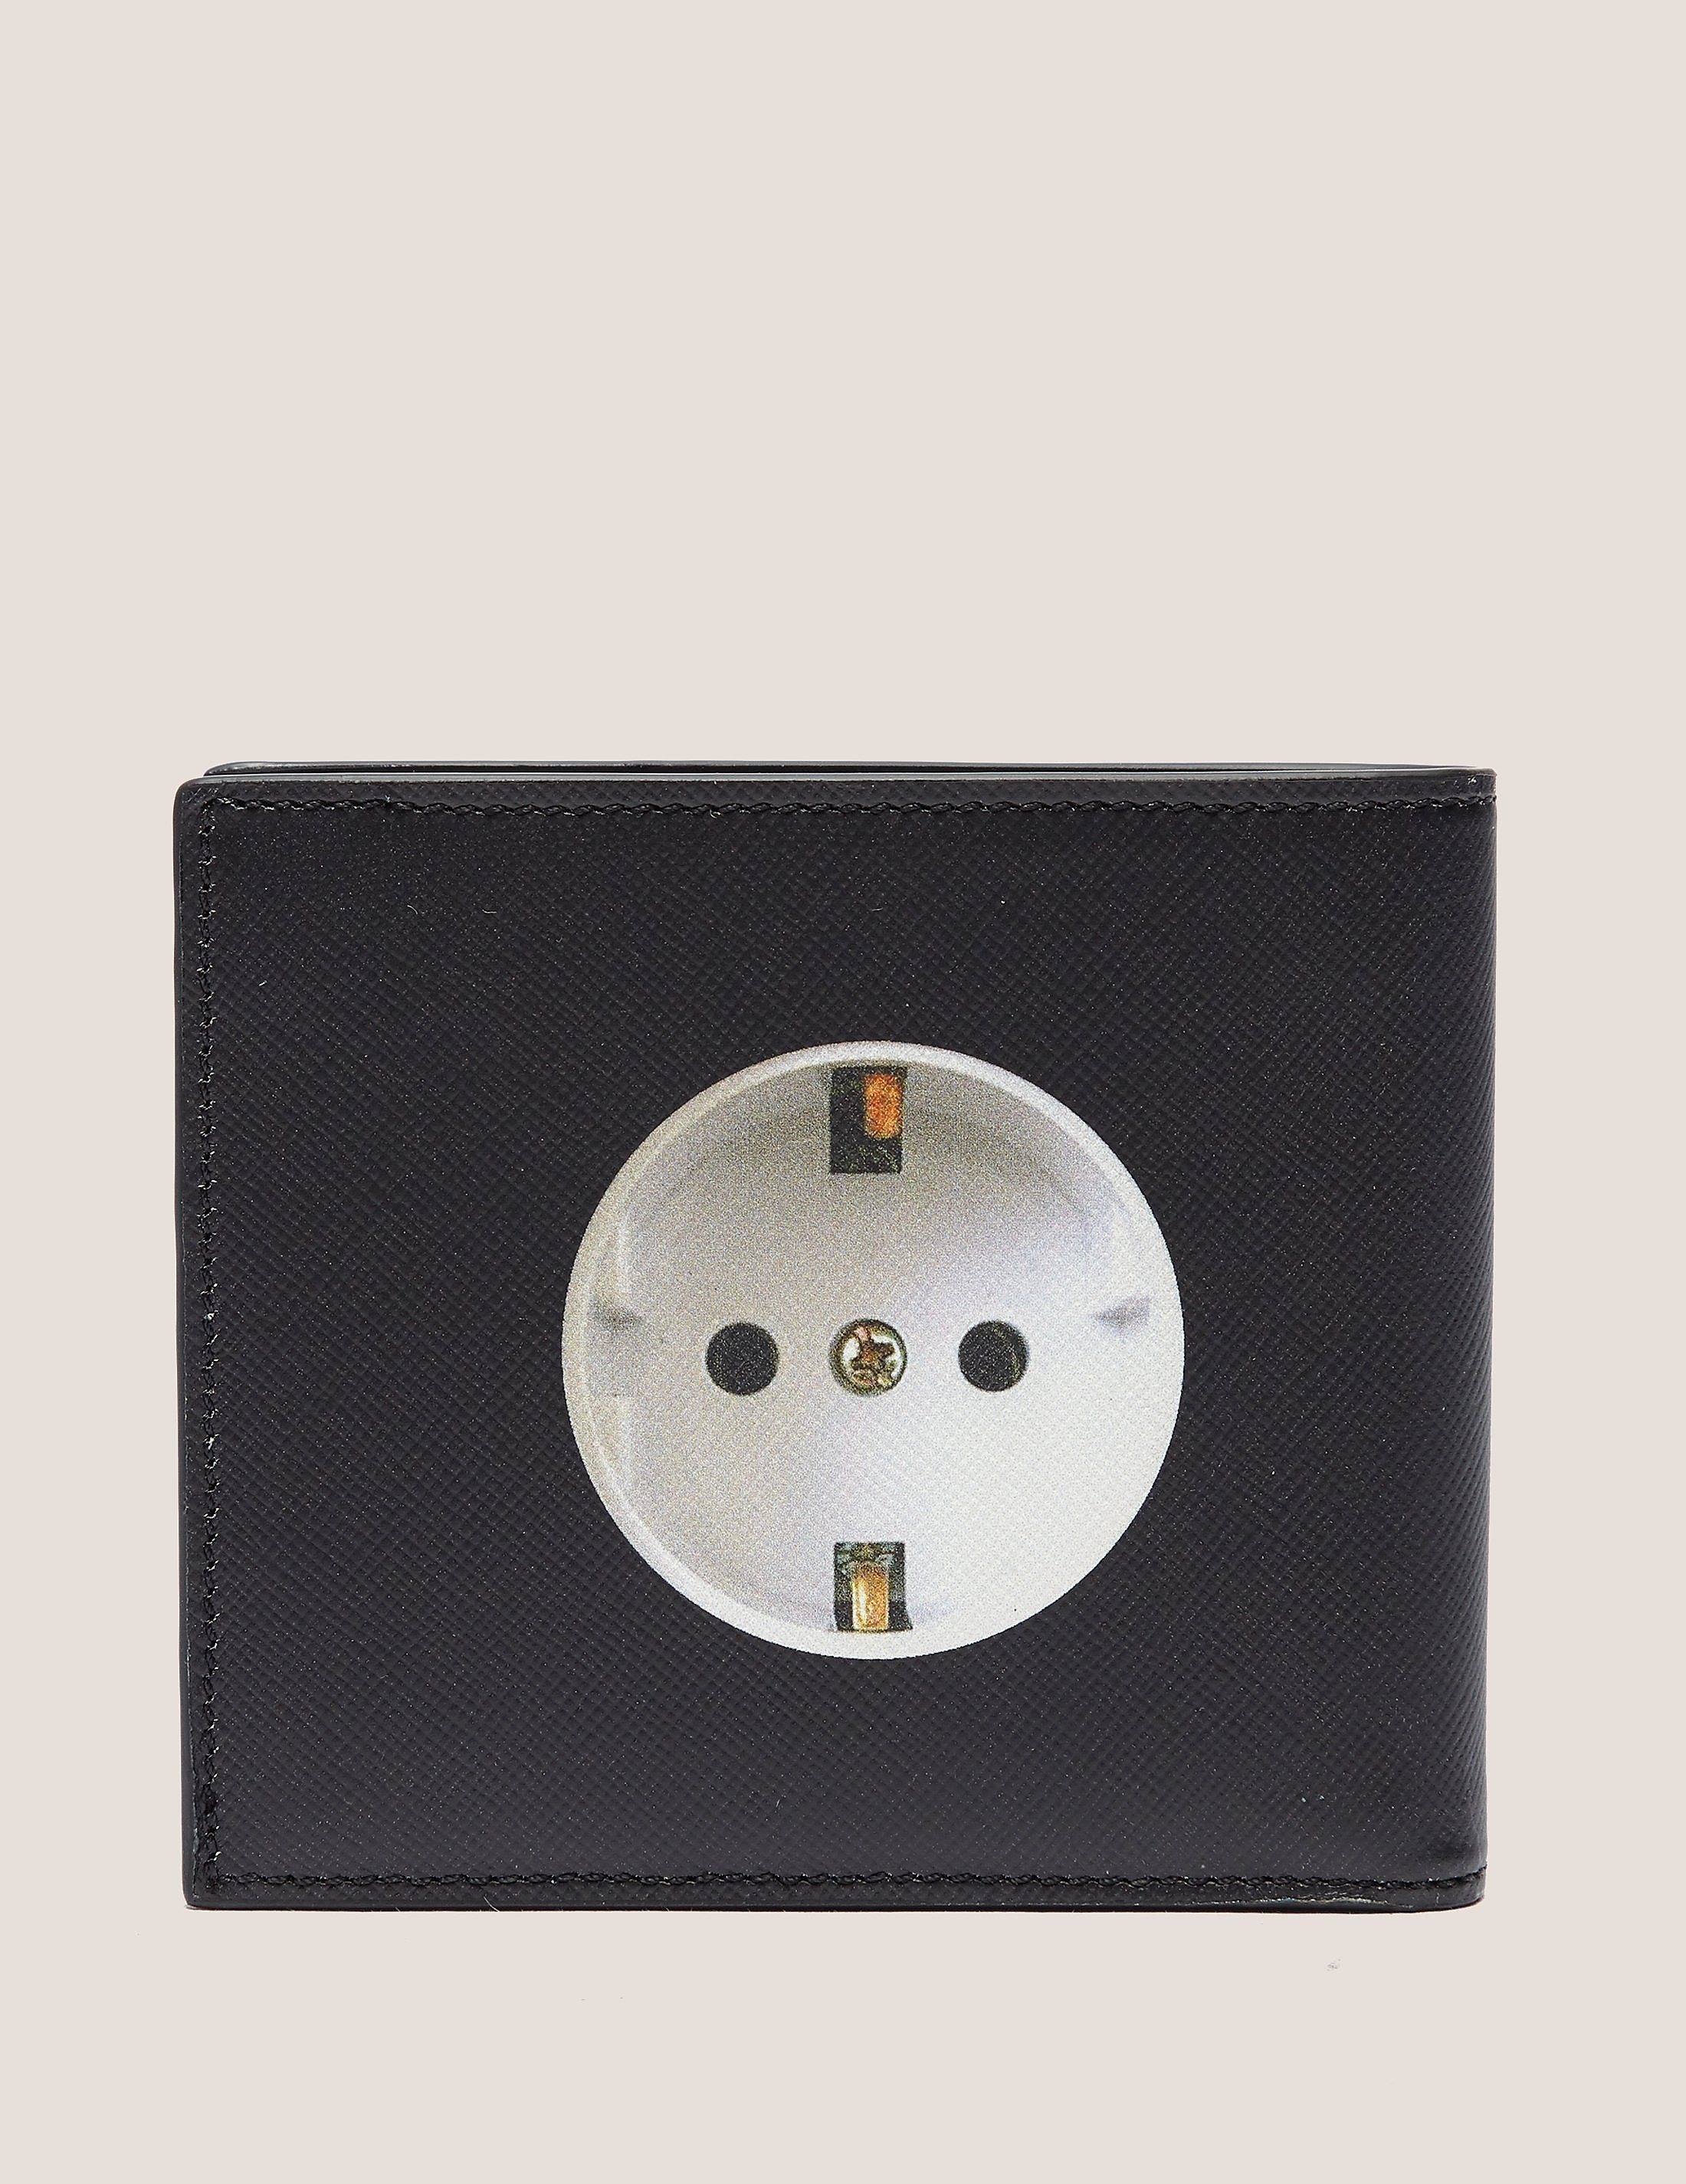 Paul Smith Plug Socket Billfold Wallet